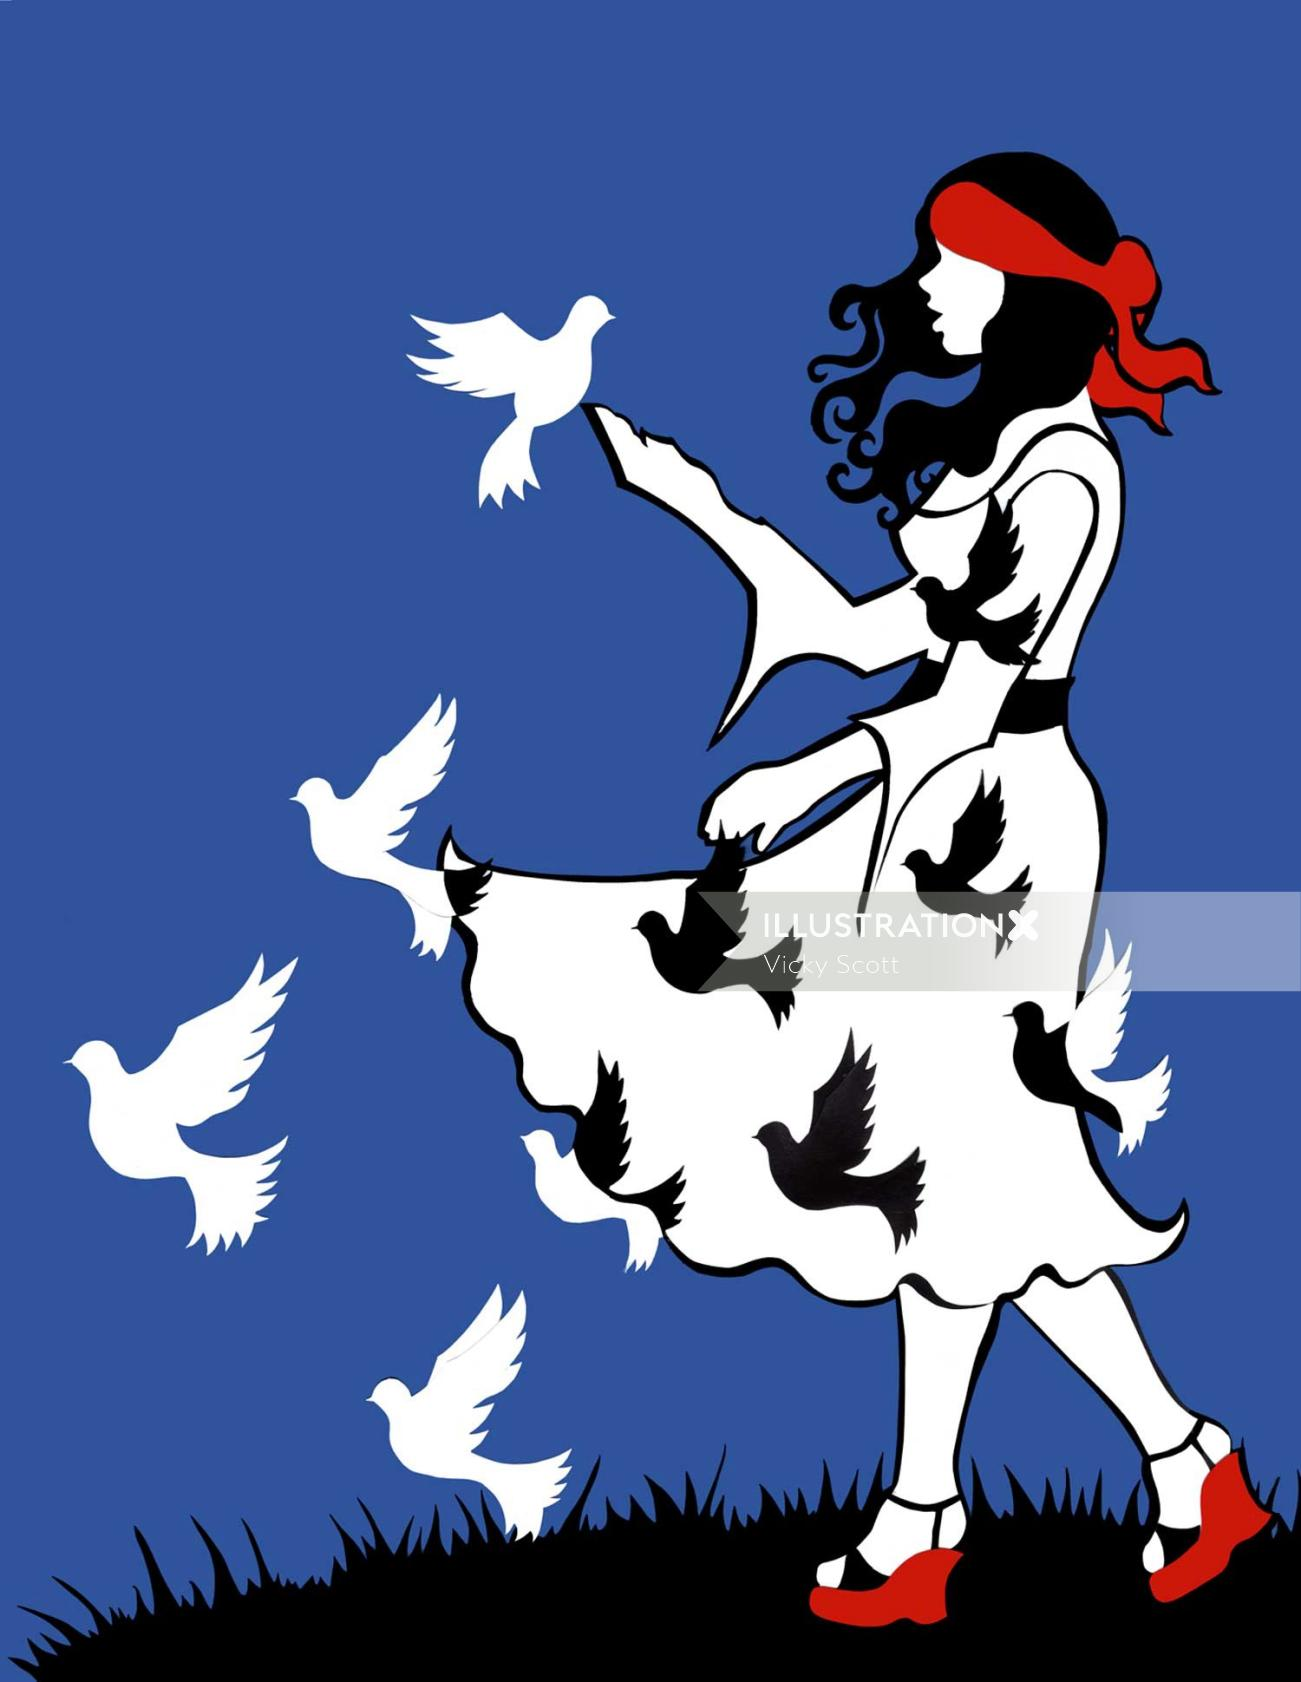 Birds flying from girl dress illustration by Vicky Scott